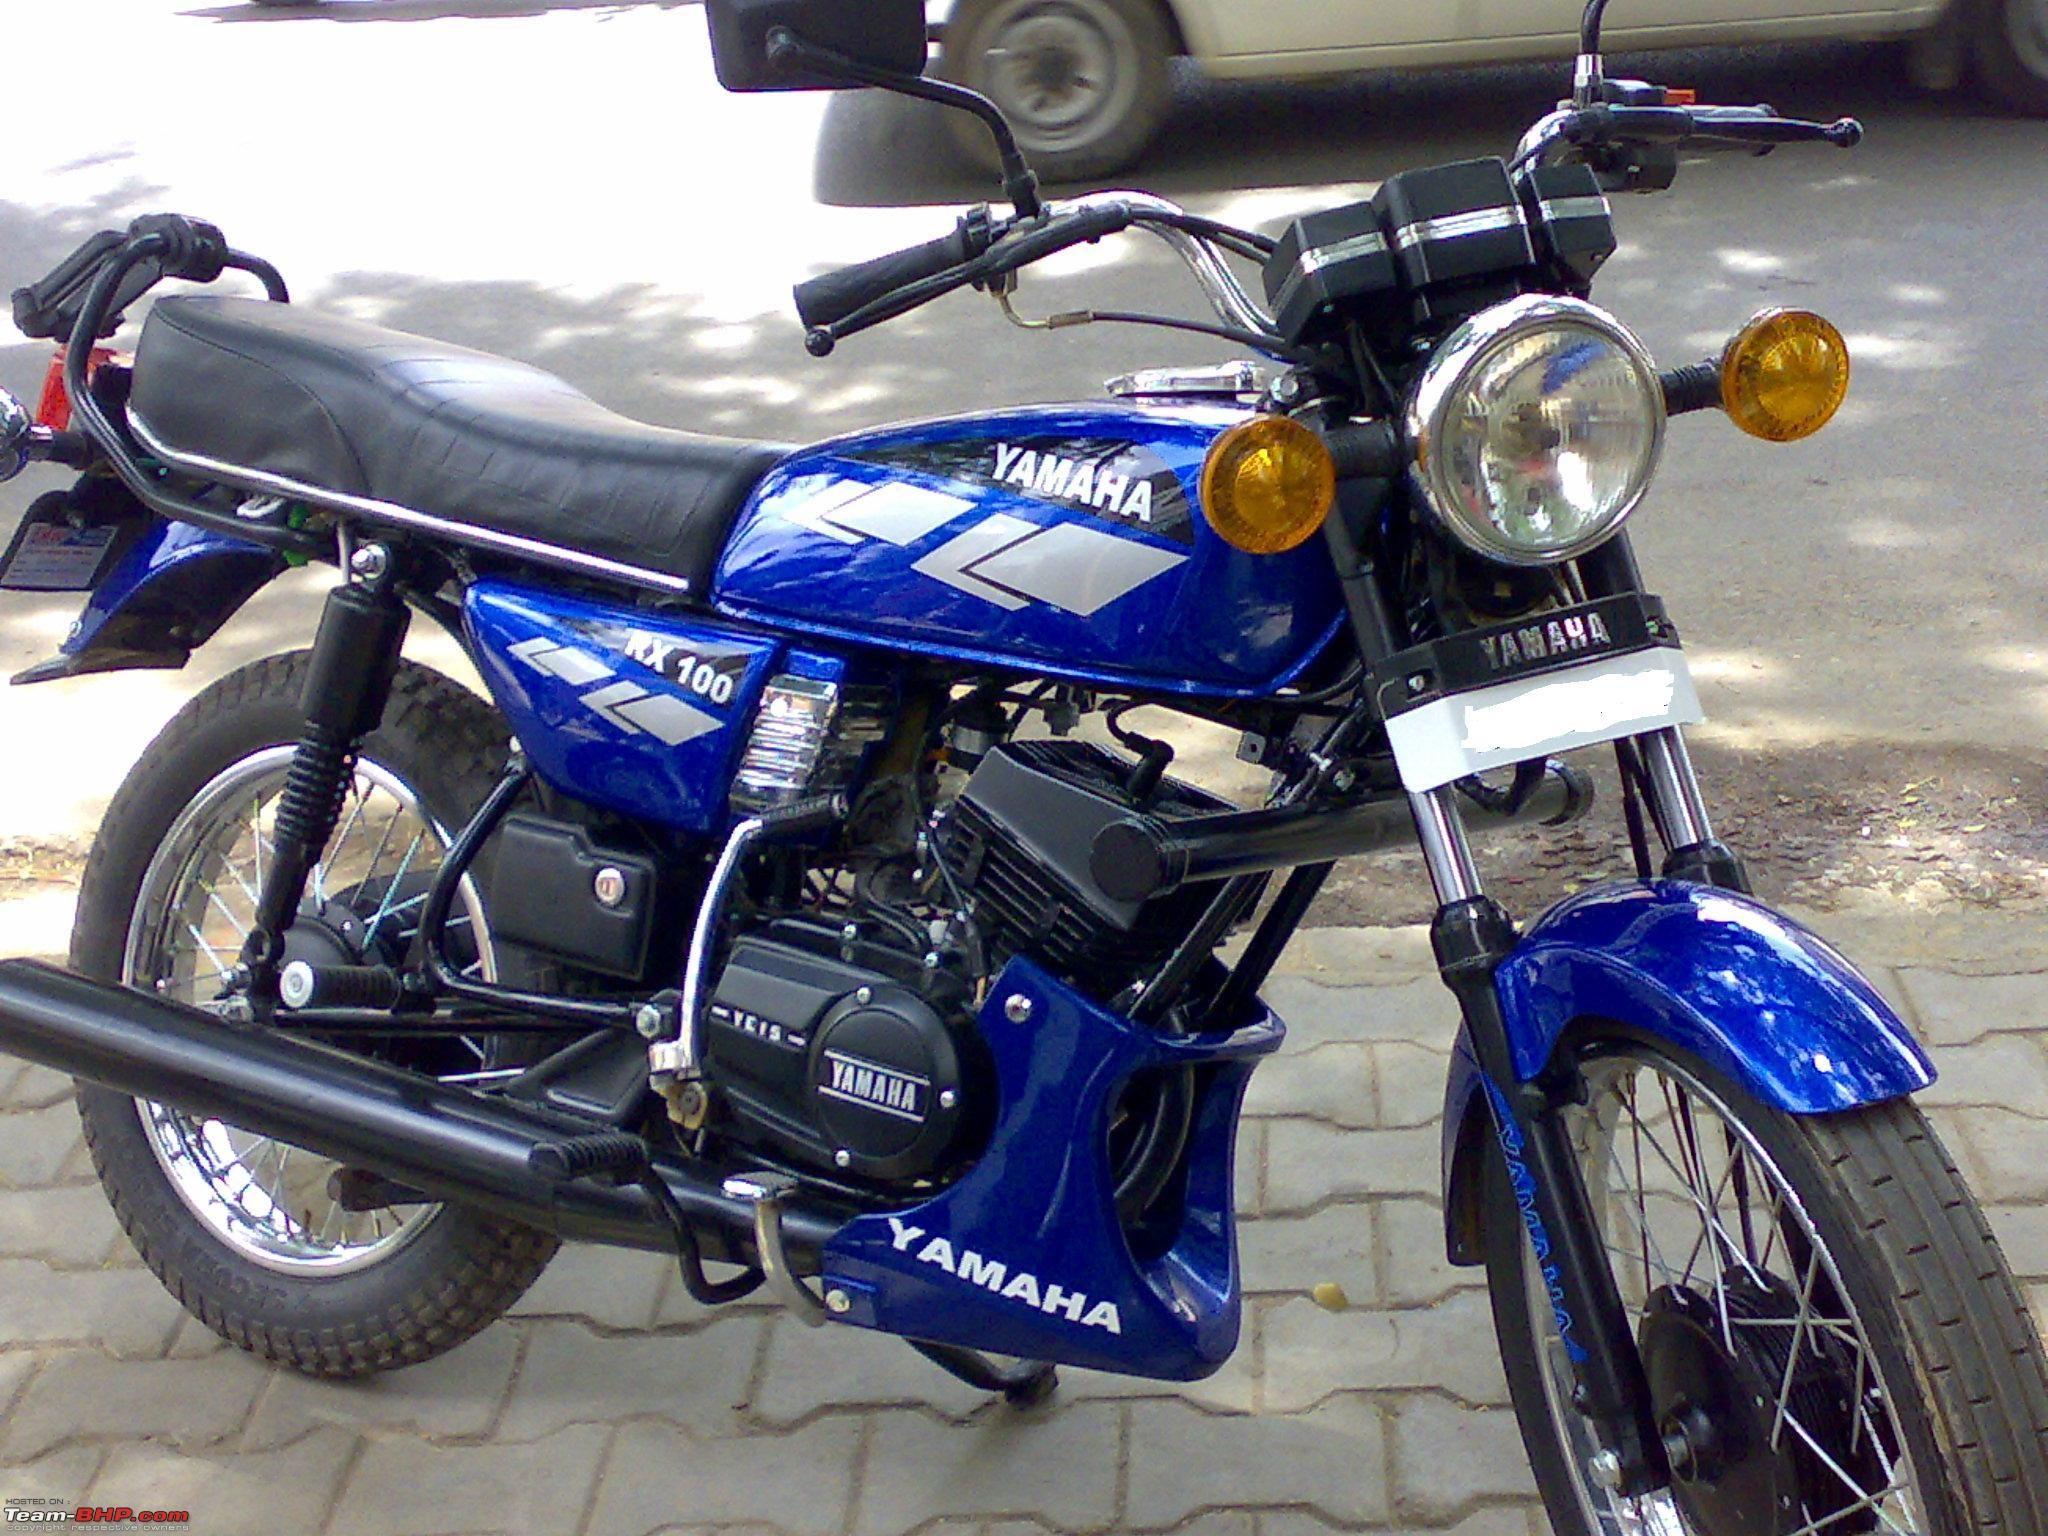 Yamaha Rx100, Yamaha, Motorcycle